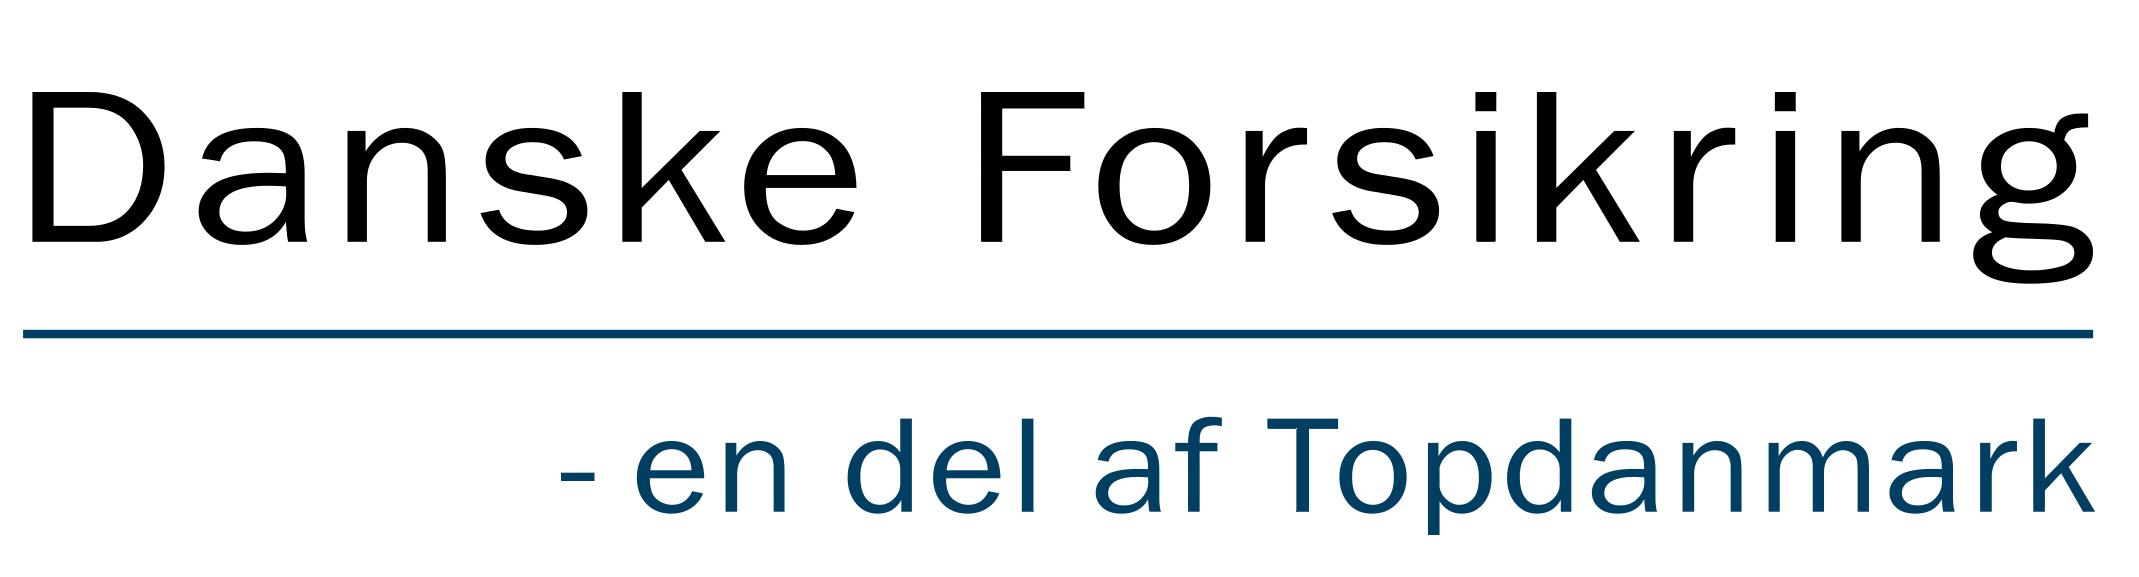 Danske Forsikring